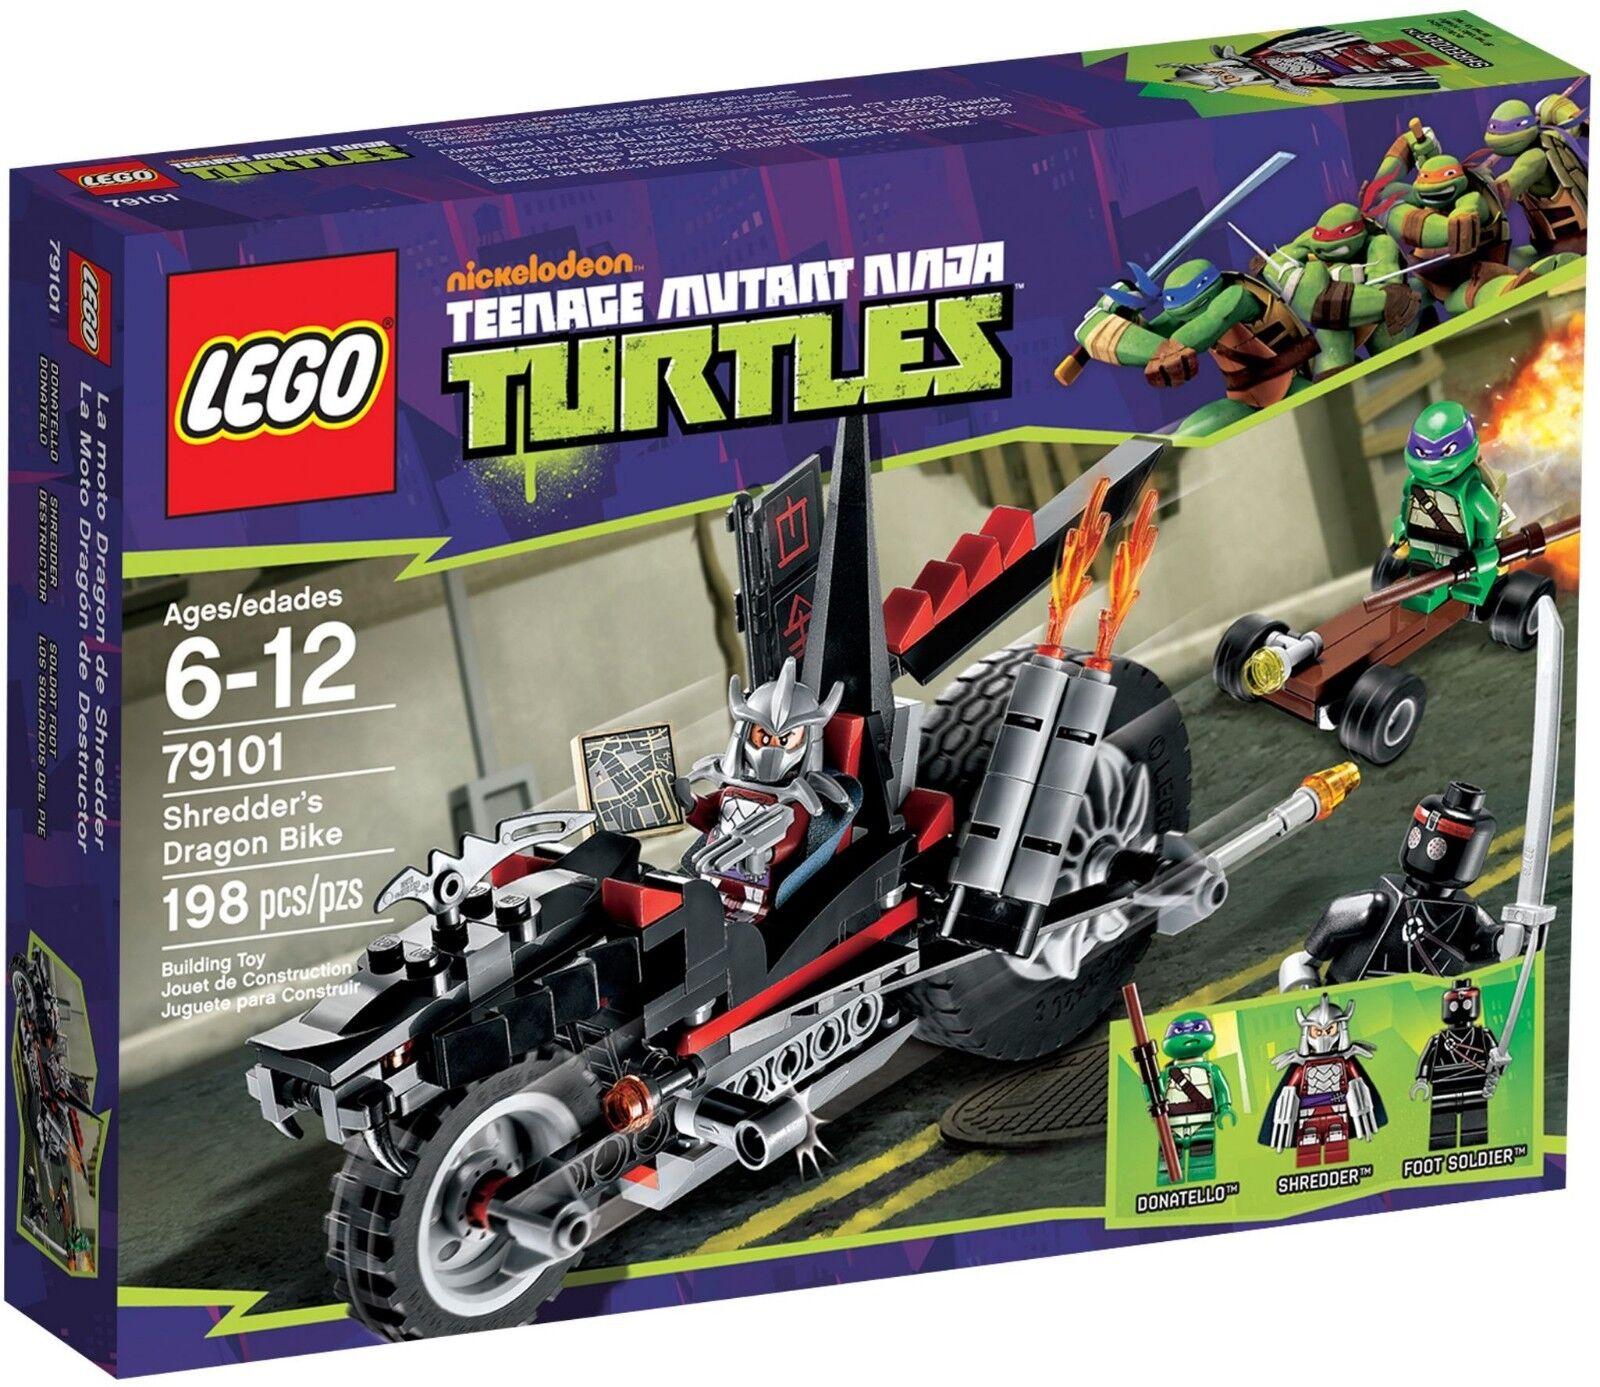 LEGO 79101 TMNT SHREDDER'S DRAGON BIKE Brand New Sealed Free P&P NINJA TURTLES